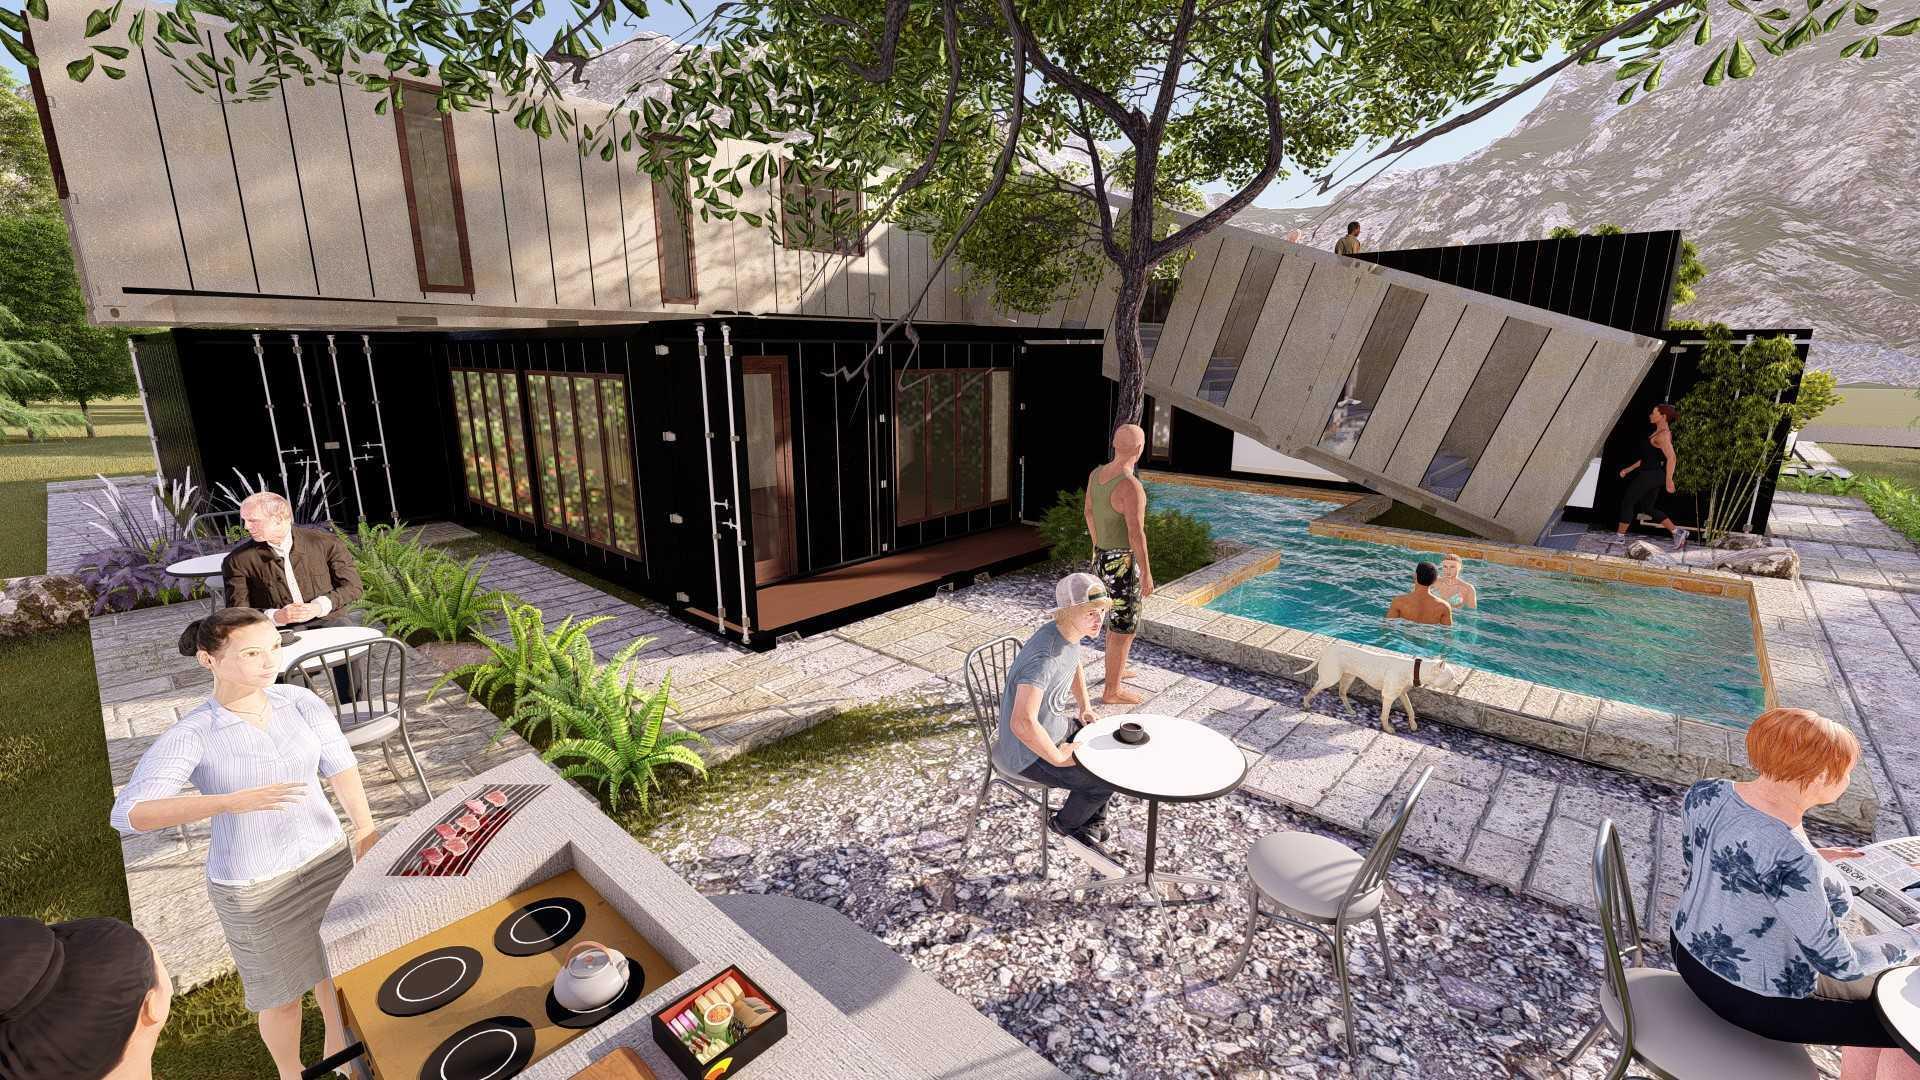 Rasi.o Arsitektur Studio Box2Box Container Villa Indonesia Indonesia Rasio-Arsitektur-Studio-Box2Box-Container-Villa   127546